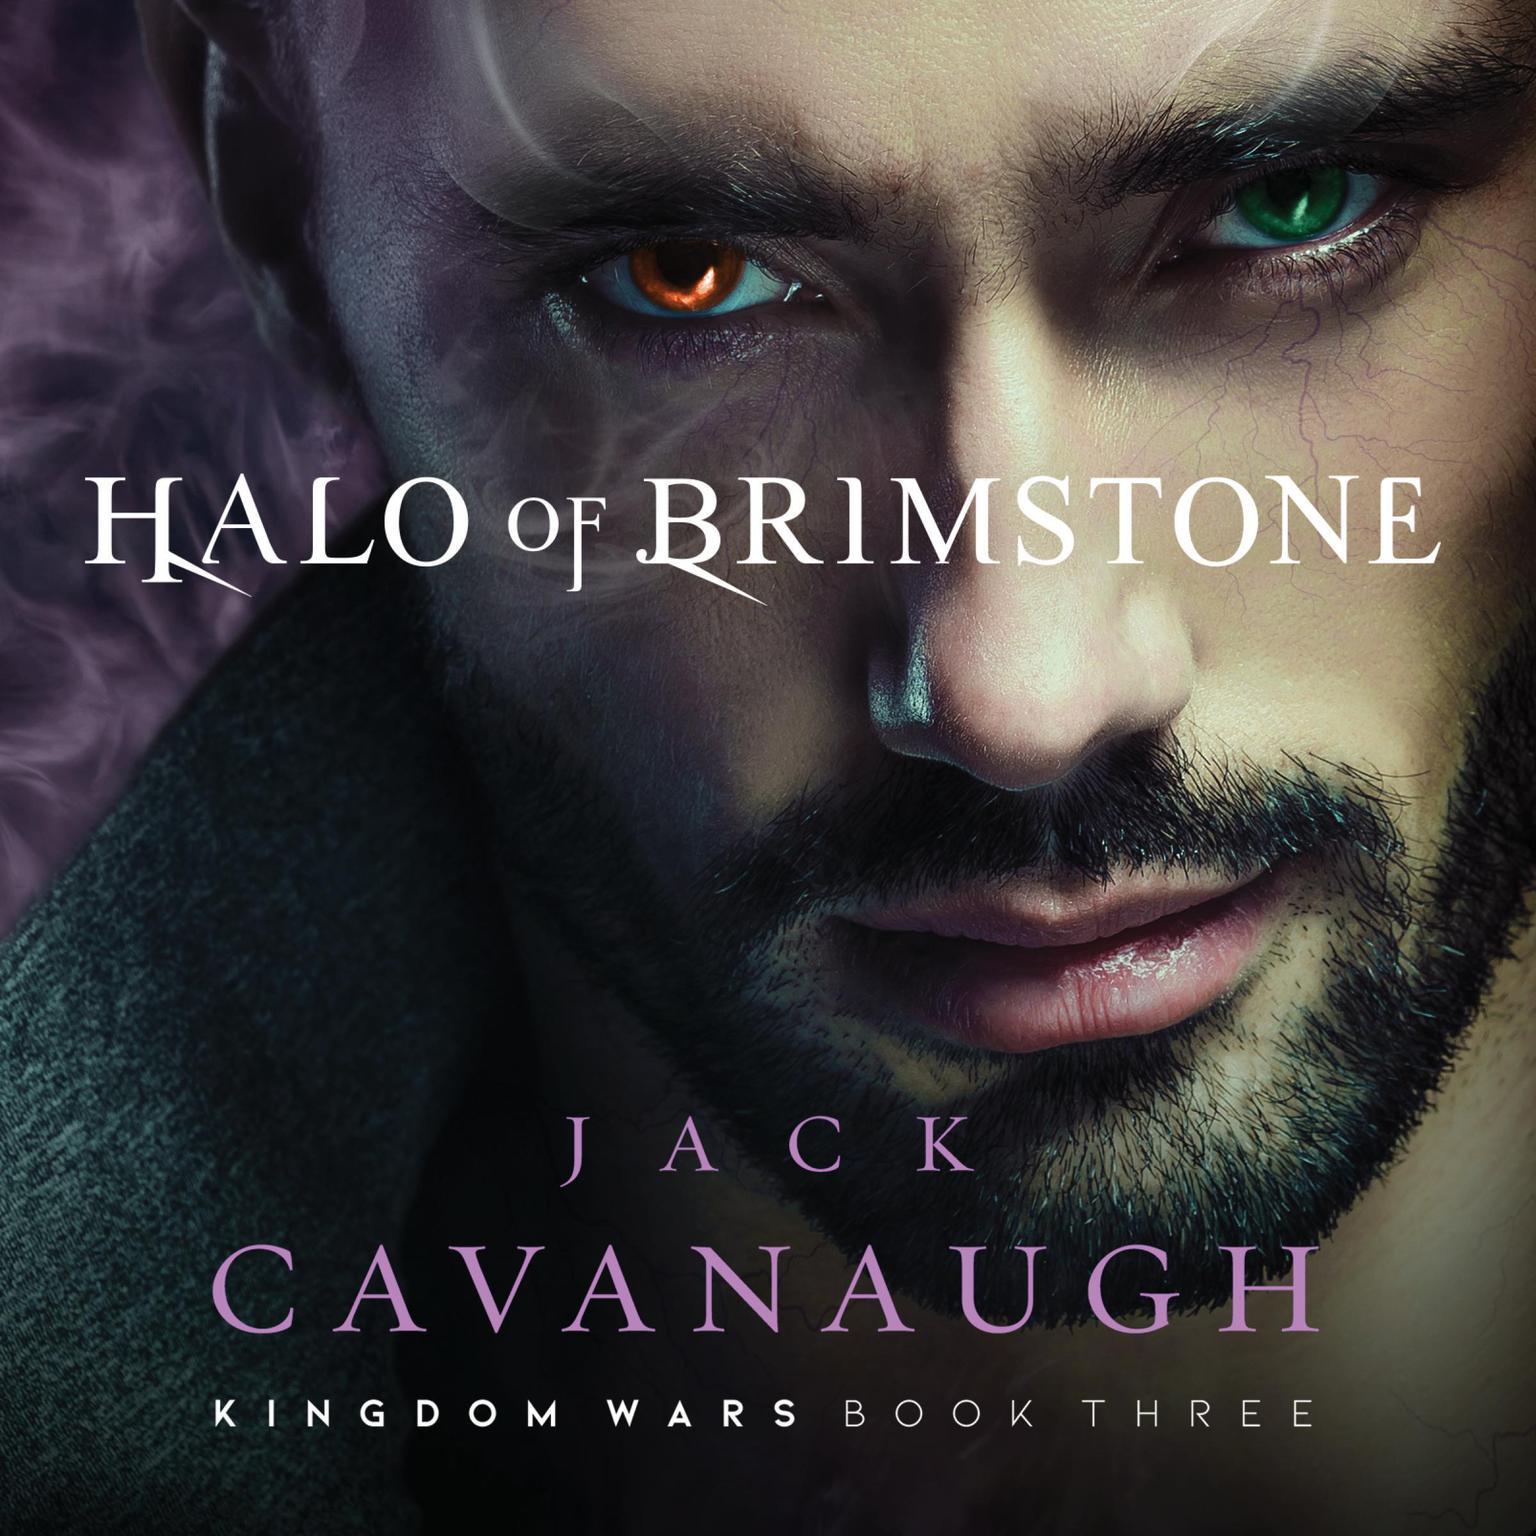 Halo of Brimstone Audiobook, by Jack Cavanaugh